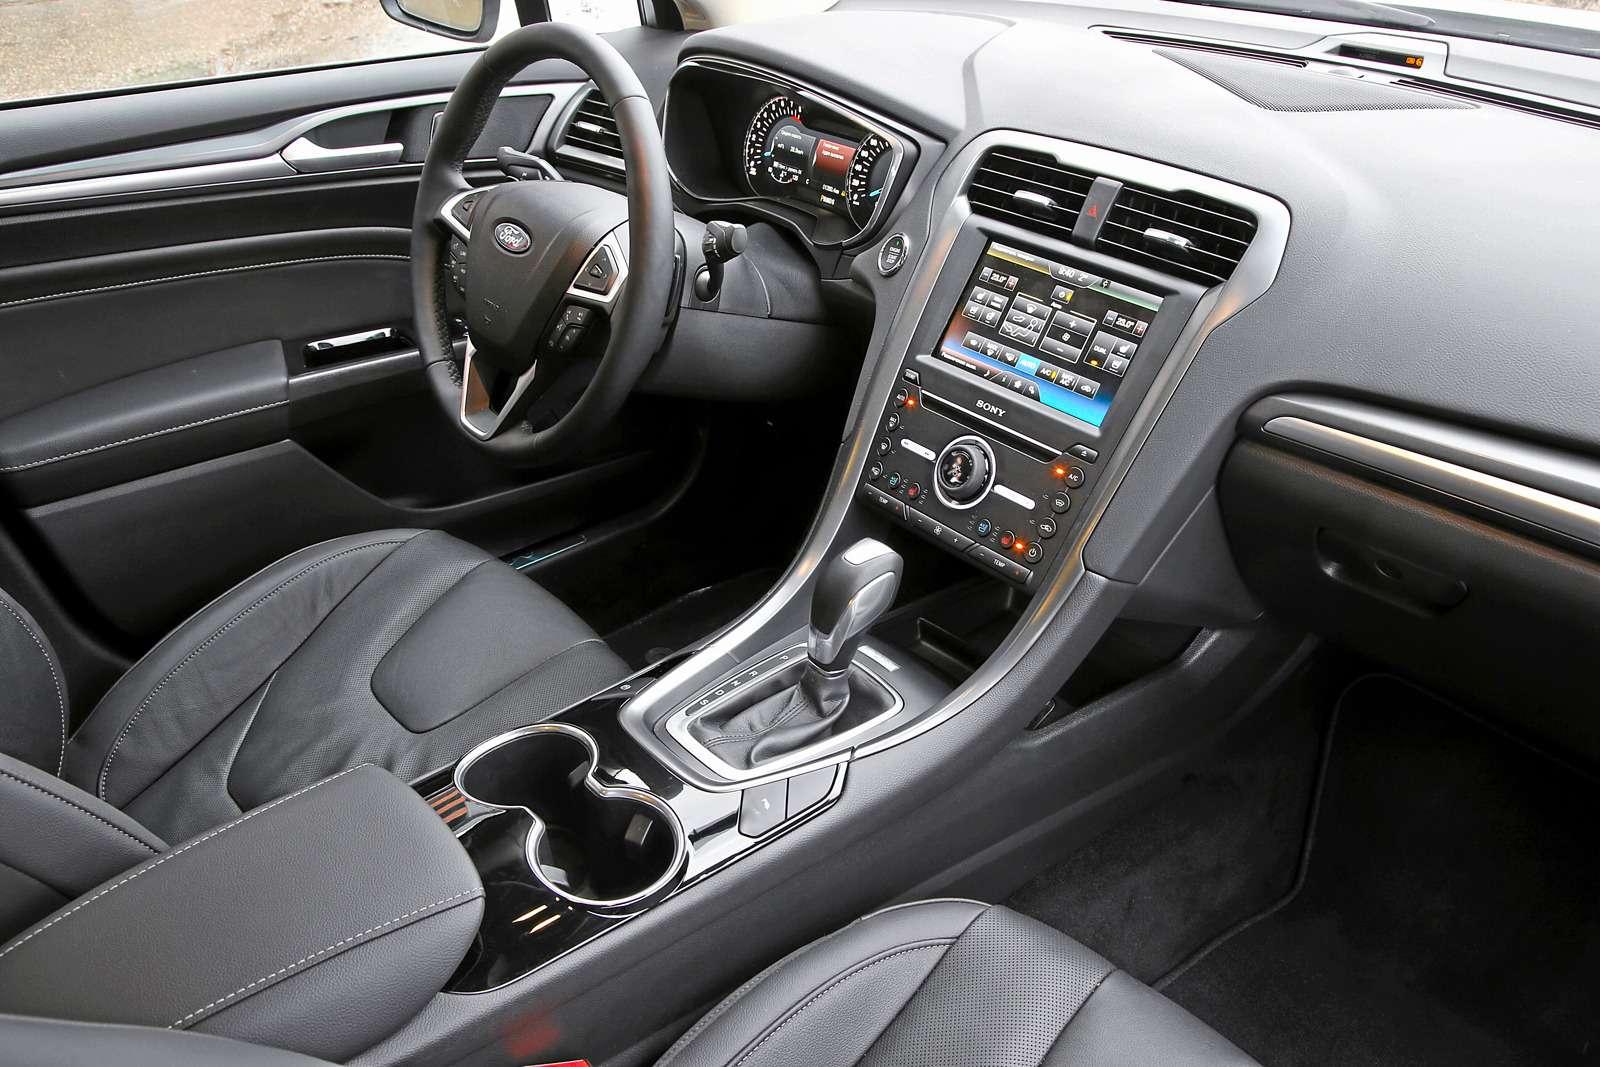 Тест Ford Mondeo ссамым мощным мотором: кому «все включено»?— фото 571858